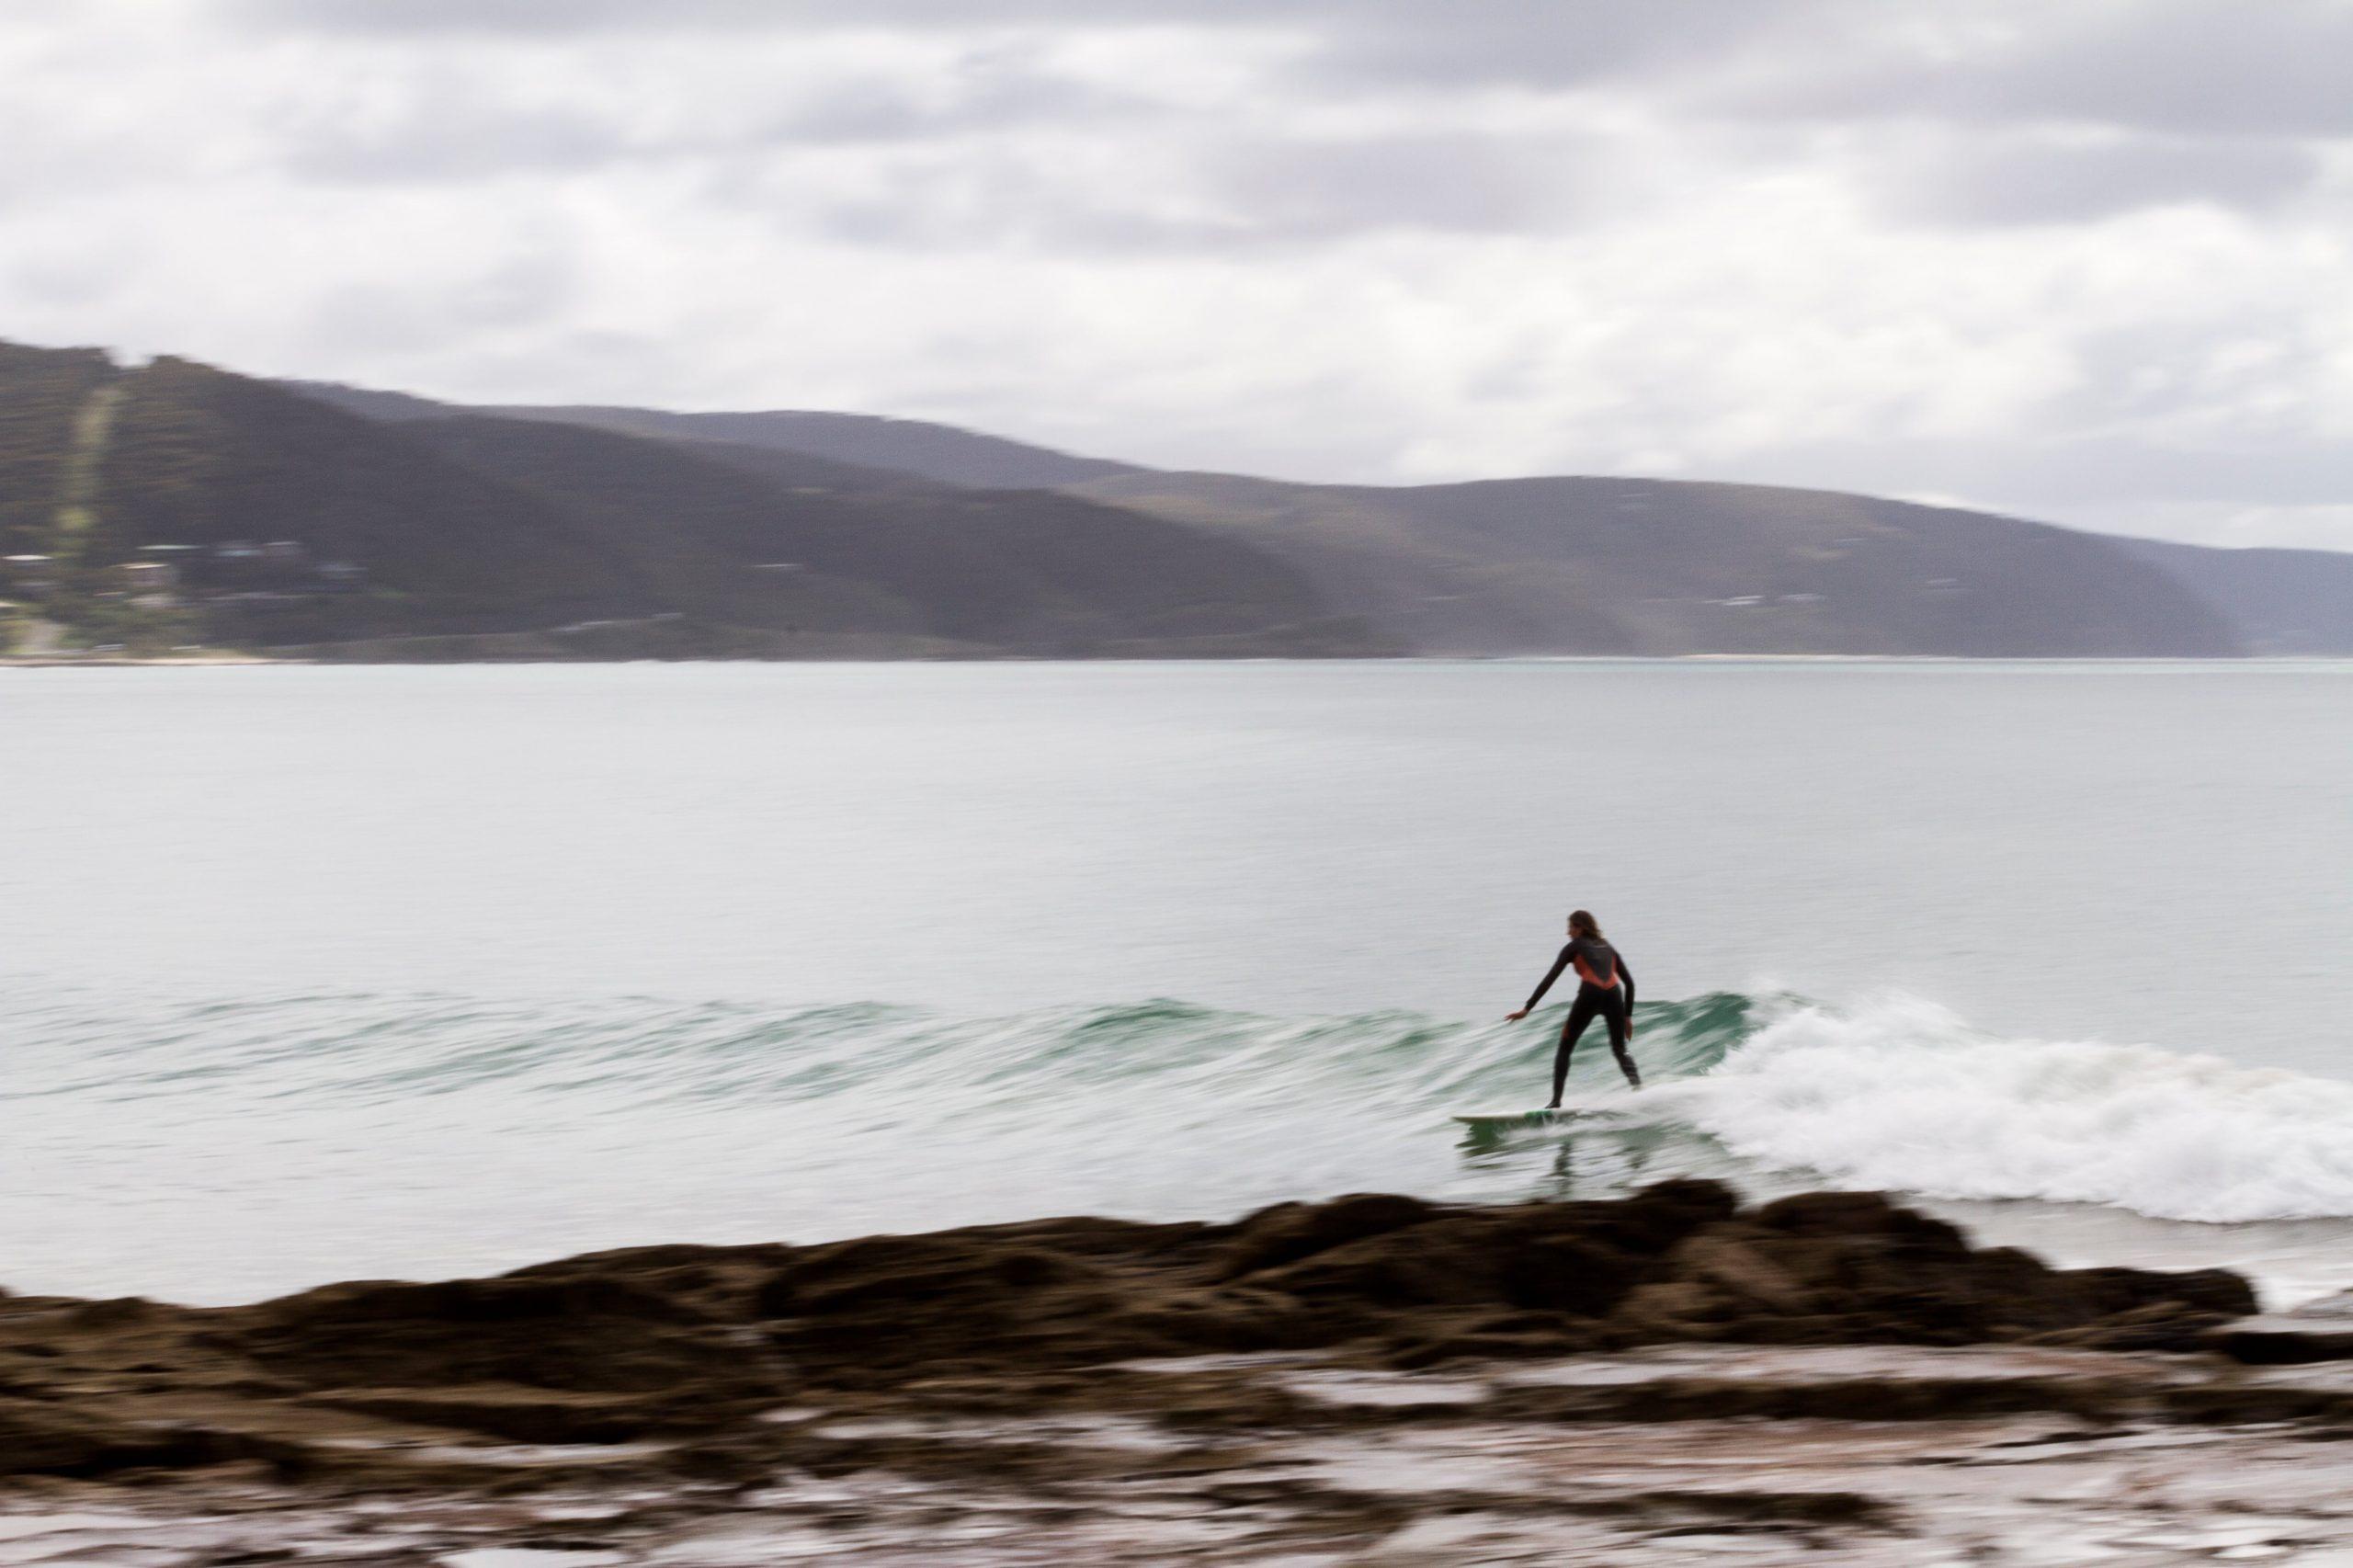 surfing in Melbourne